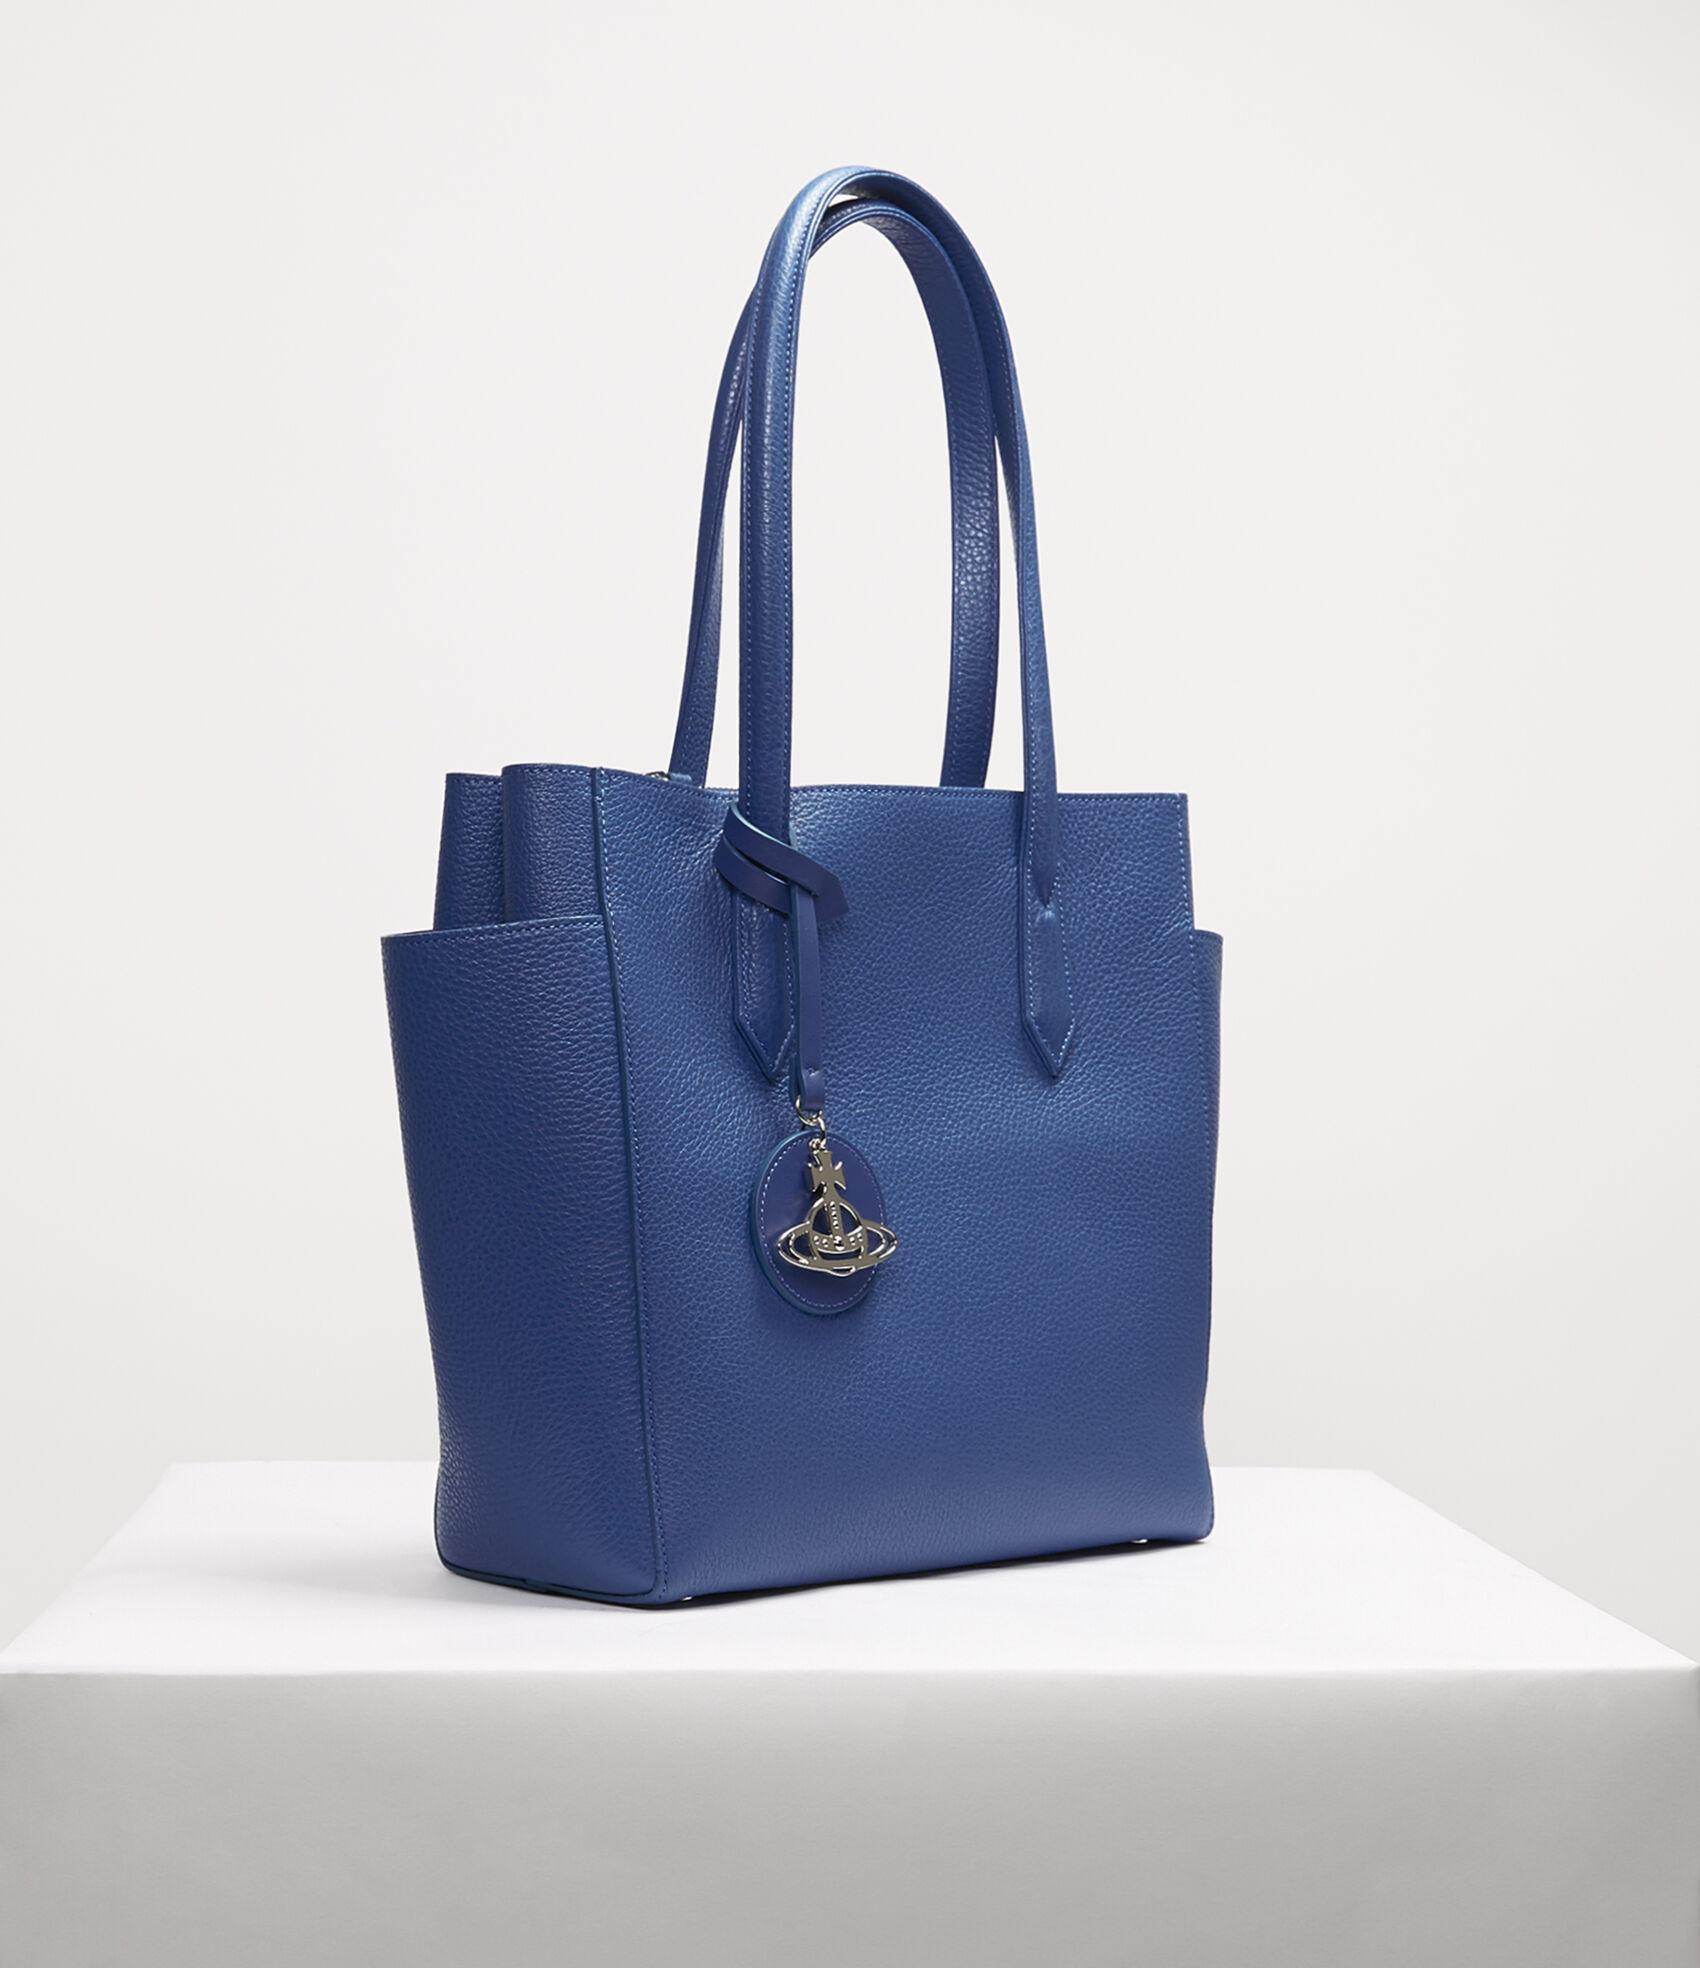 127986f53bc Rachel Small Shopper Bag Blue | Women's Handbags | Vivienne Westwood